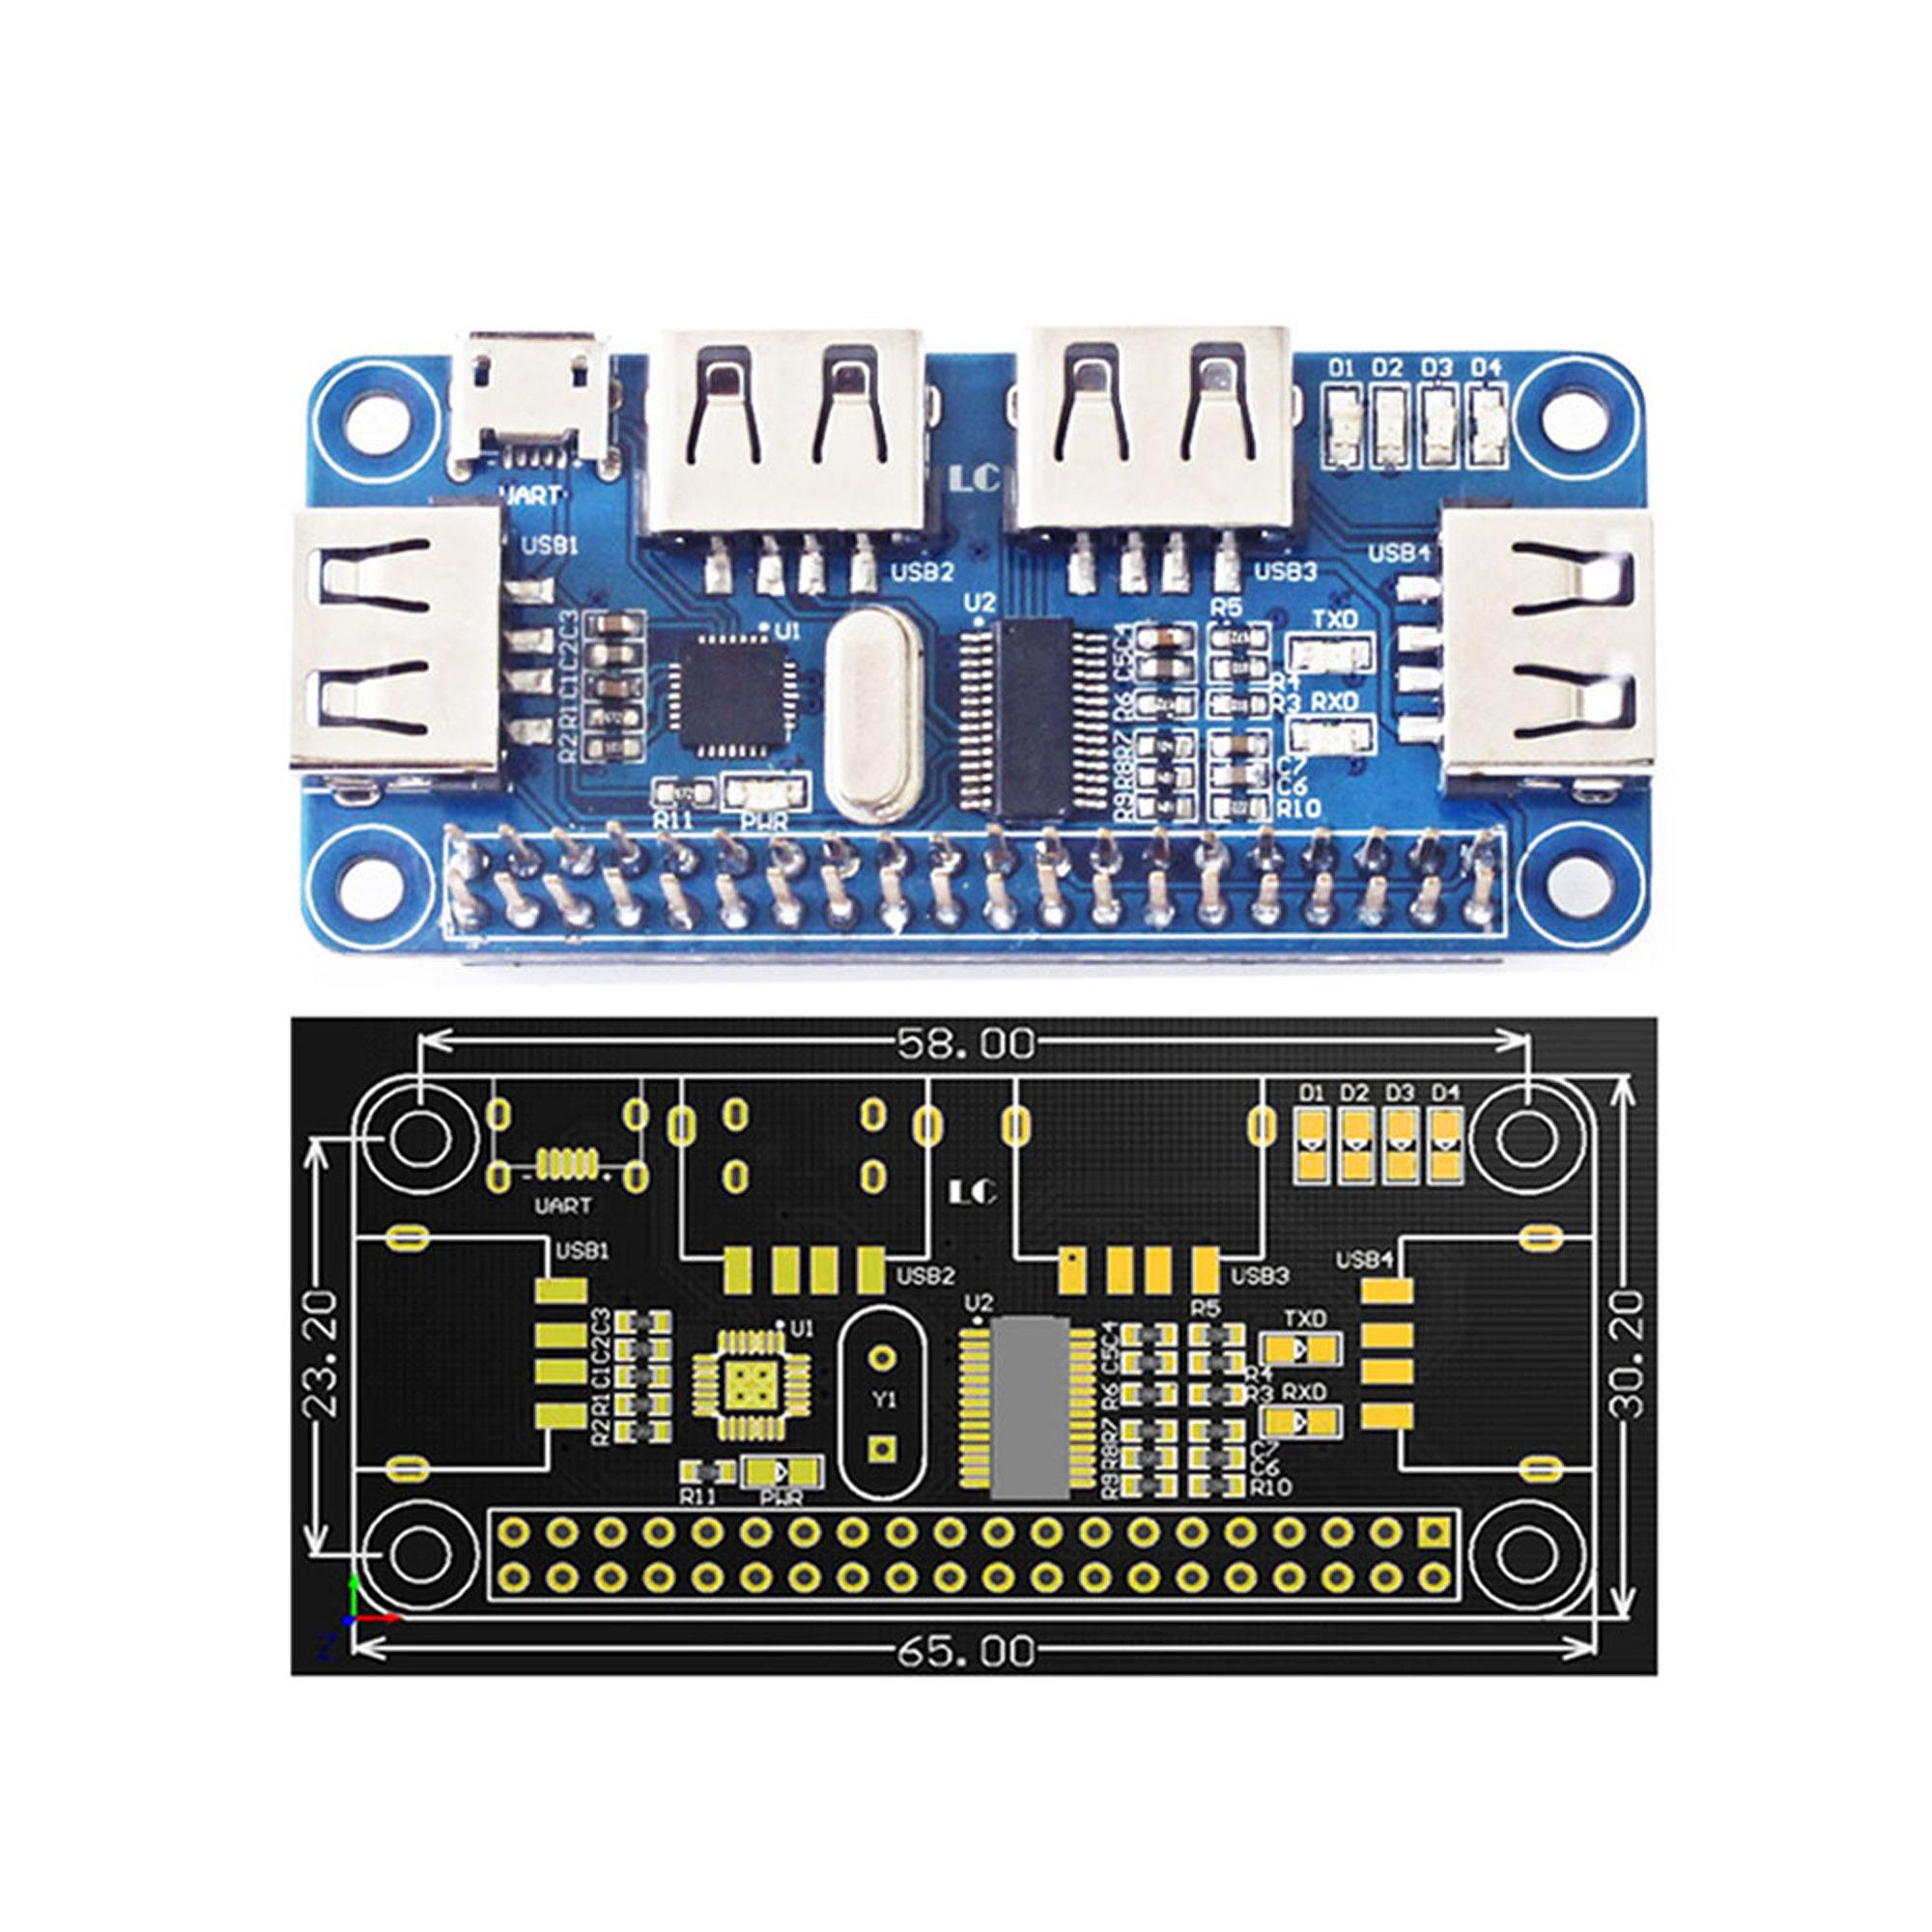 Details about 4 Port USB HUB HAT Expansion Board Raspberry Pi 3 Model B  /Zero V1,3/Zero W US